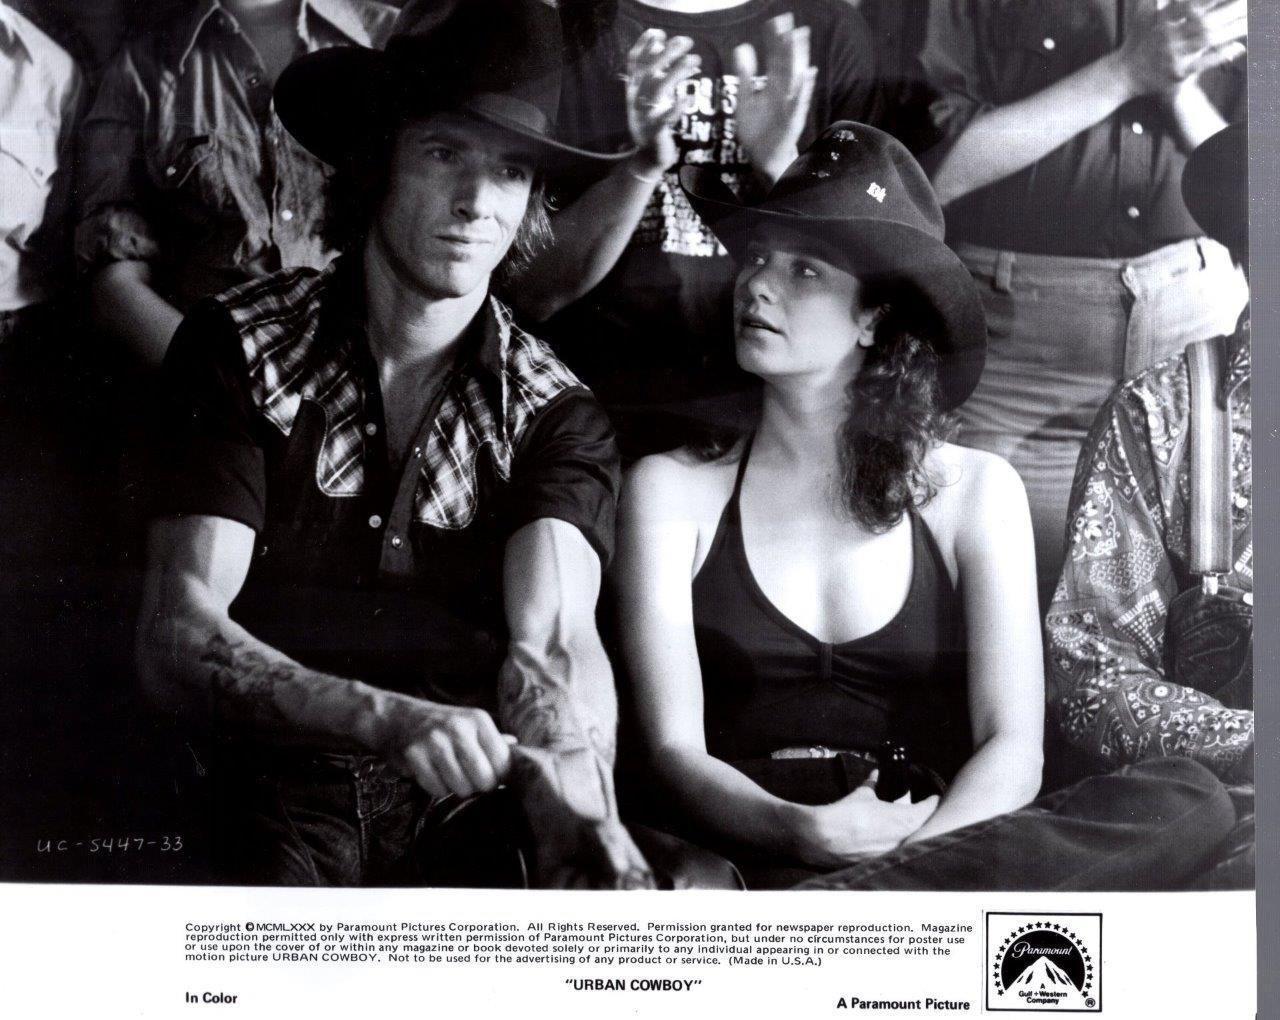 1980 Urban Cowboy Urban cowboy, Vintage movies, John